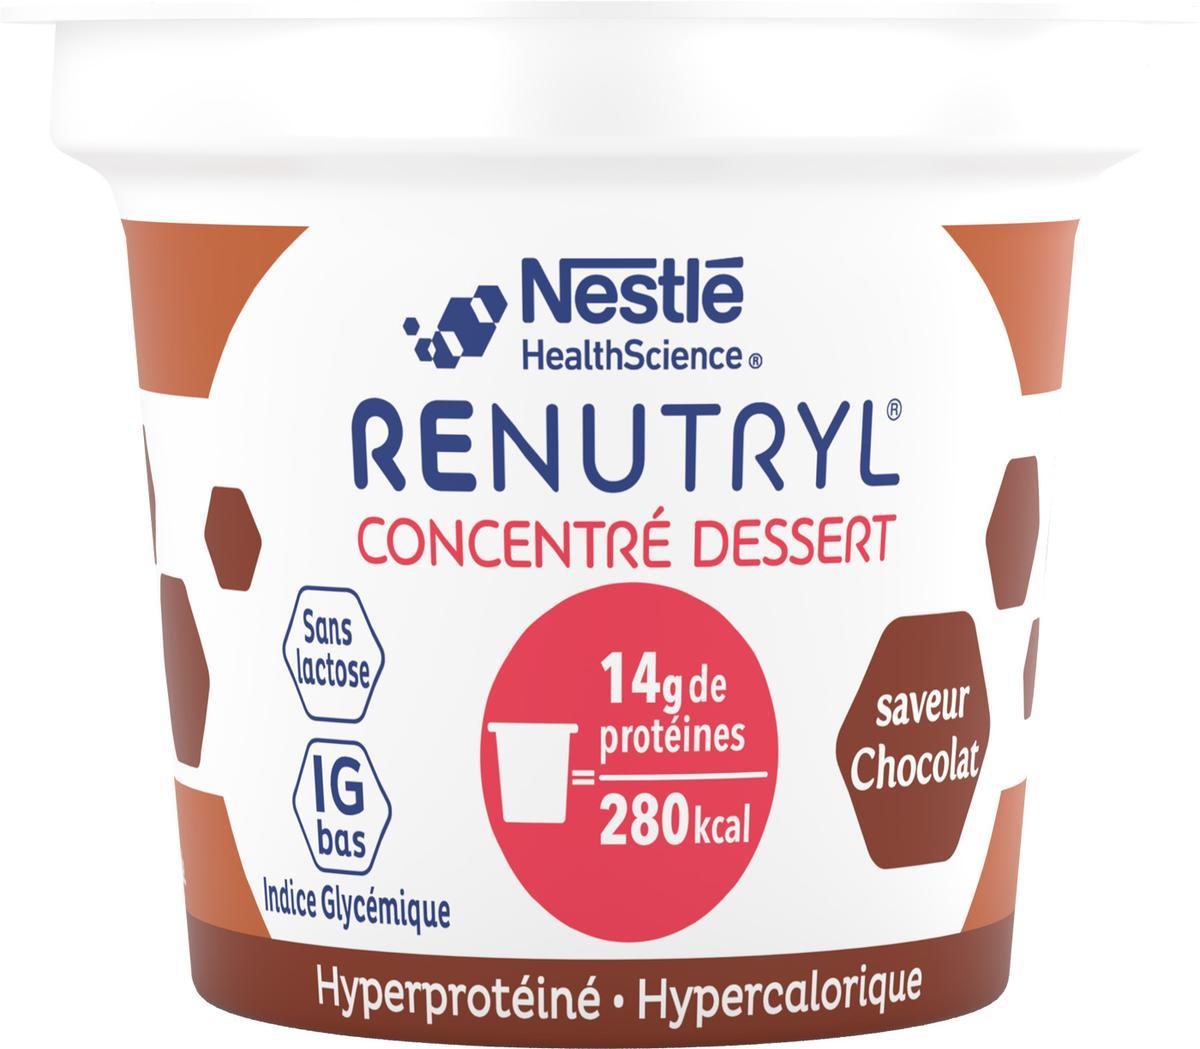 Renutryl Concentre Dessert Saveur Chocolat 4 X 140 G